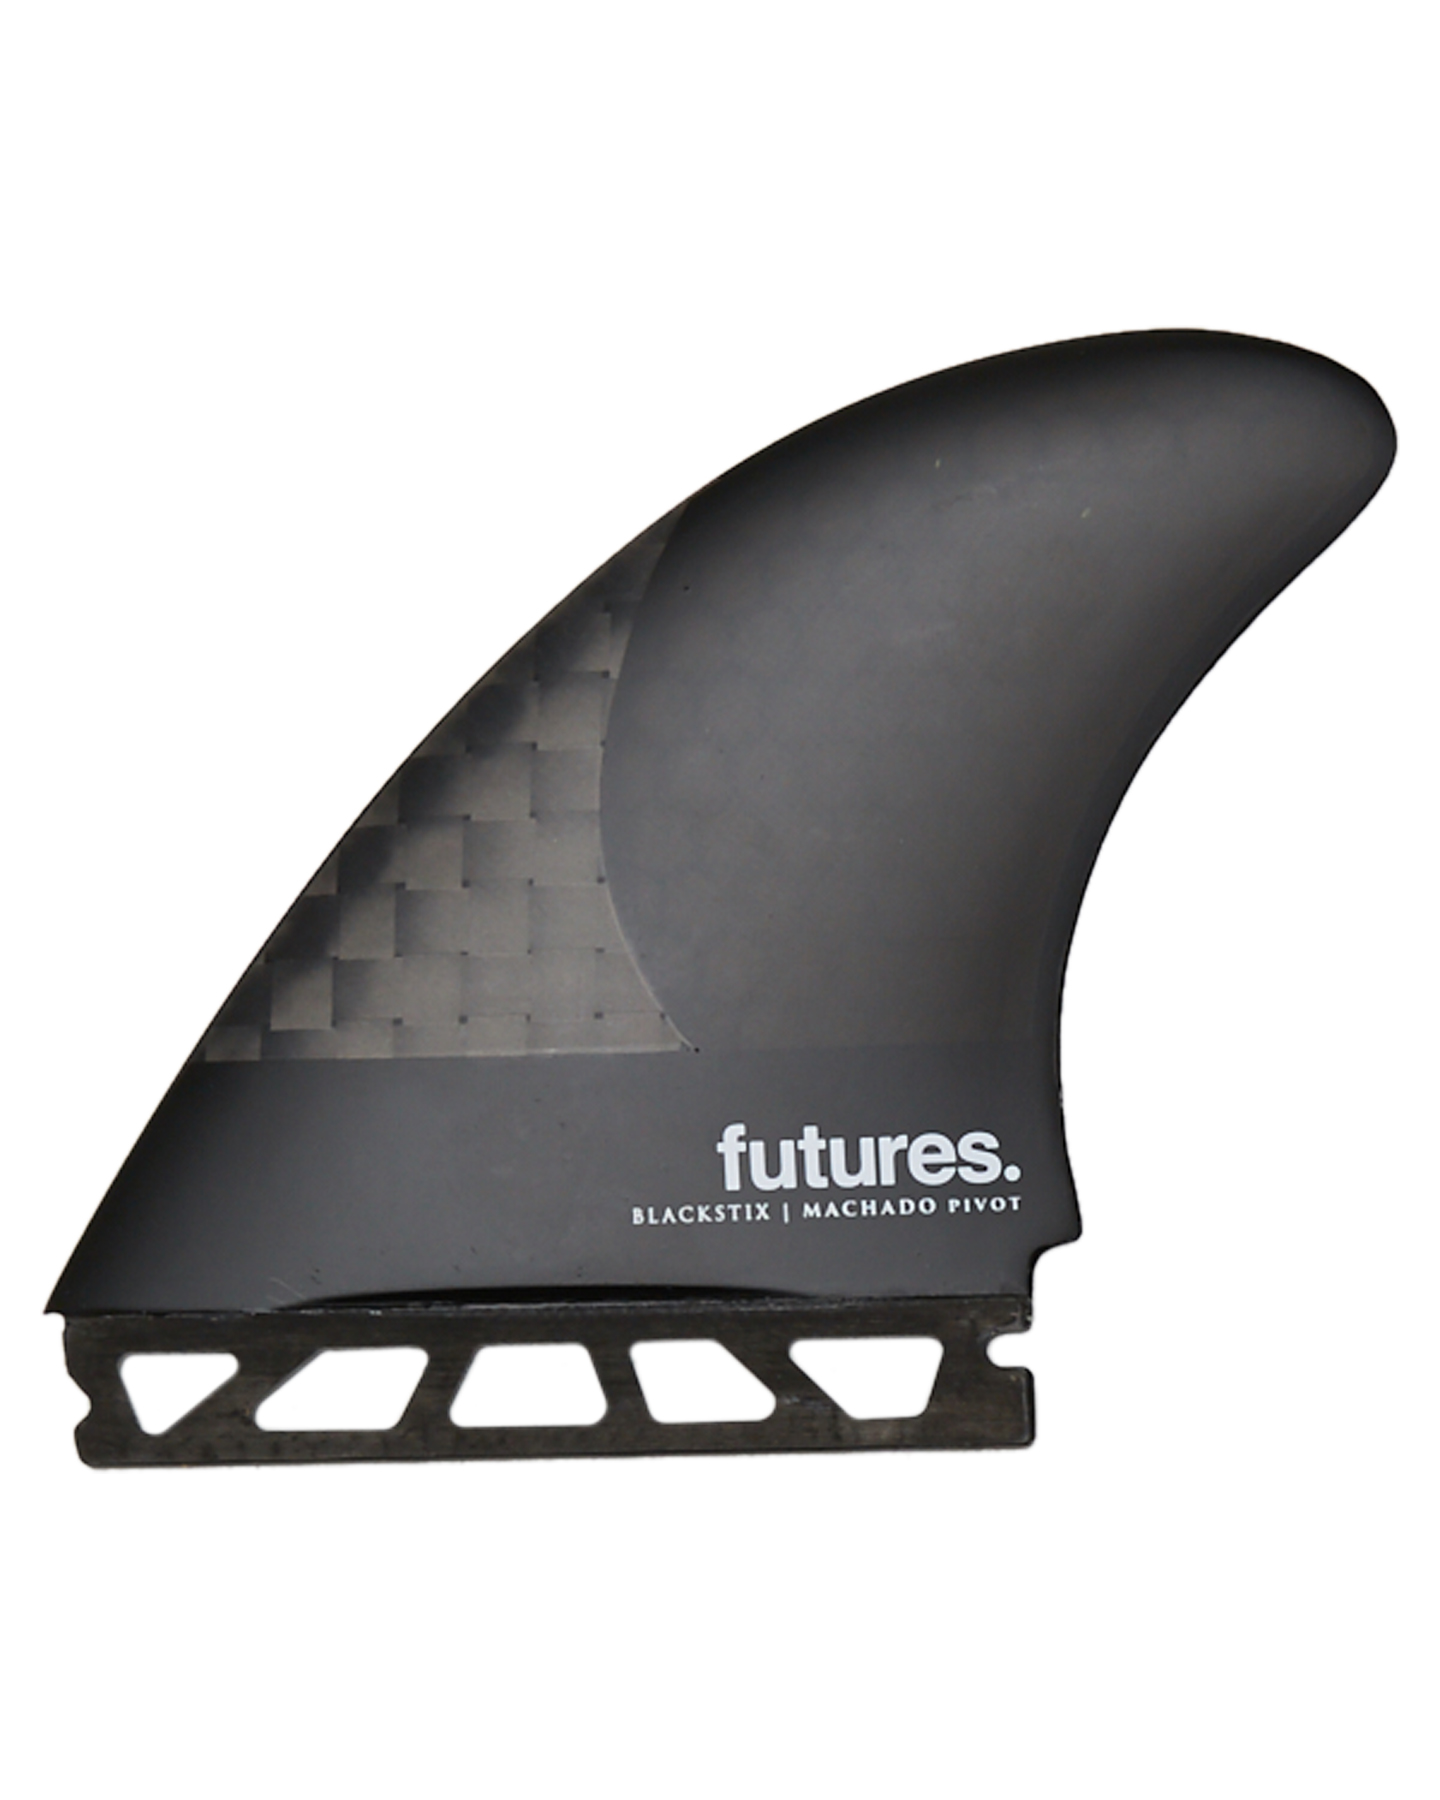 Future Fins Machado Pivot Blackstix 3.0 Thruster Fins Swirl